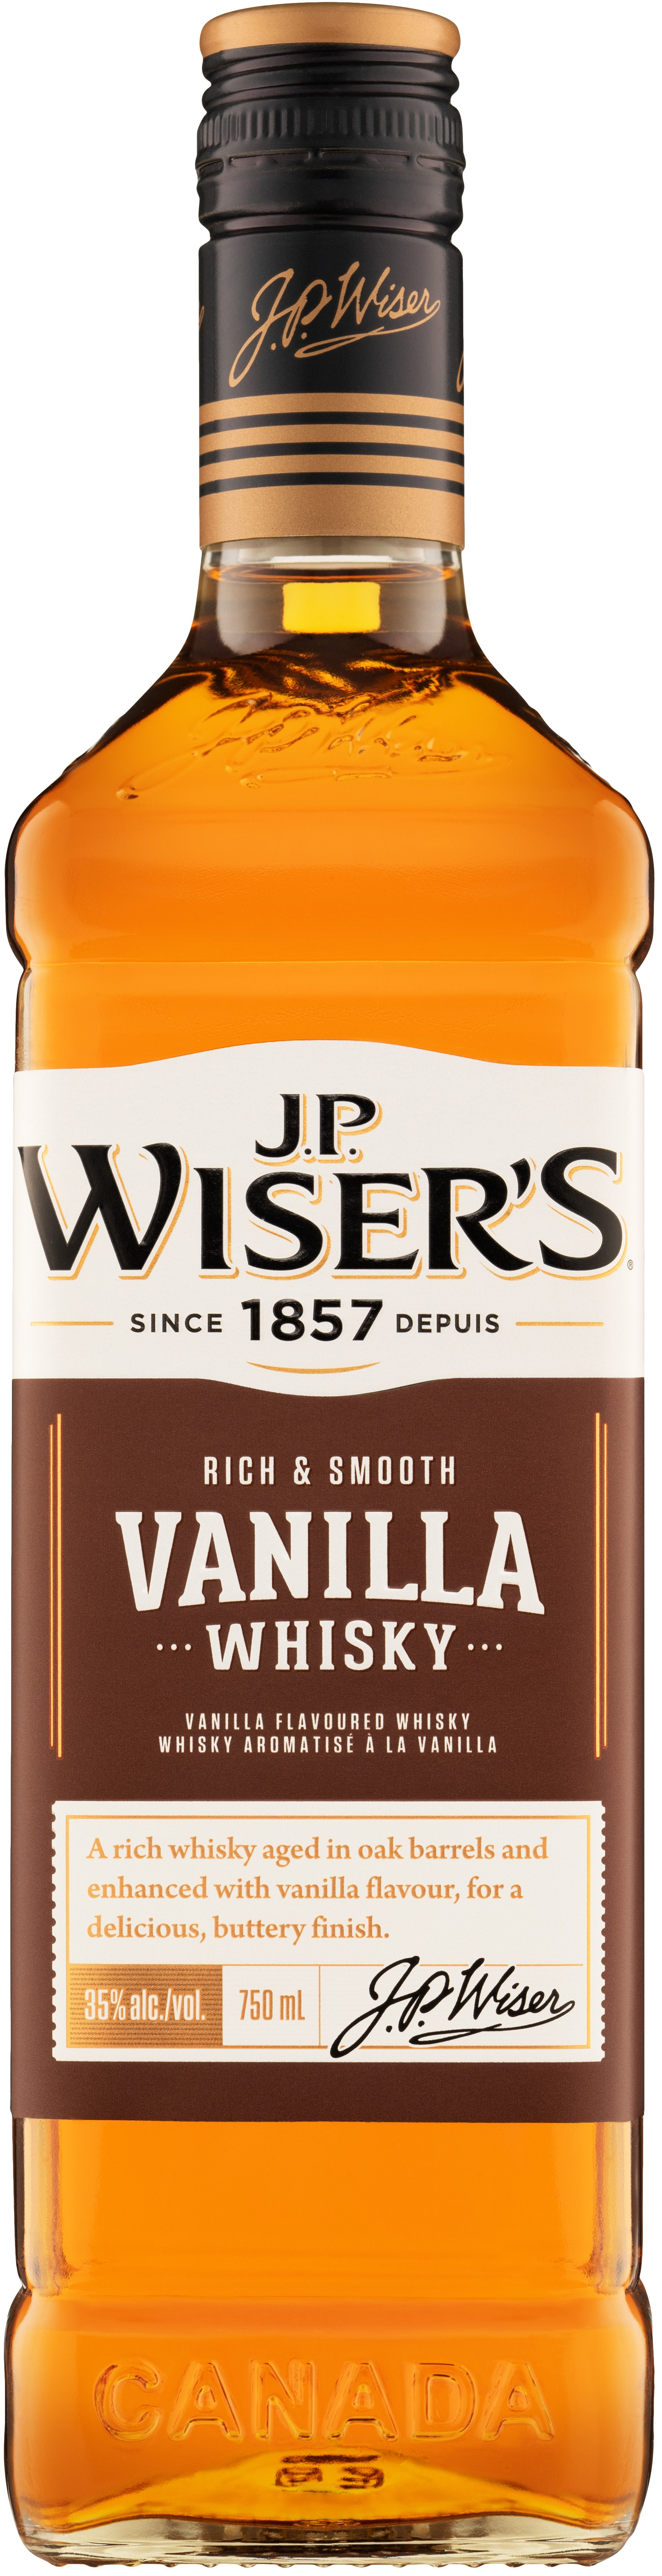 J.P. Wiser's Vanilla Whisky 750ml